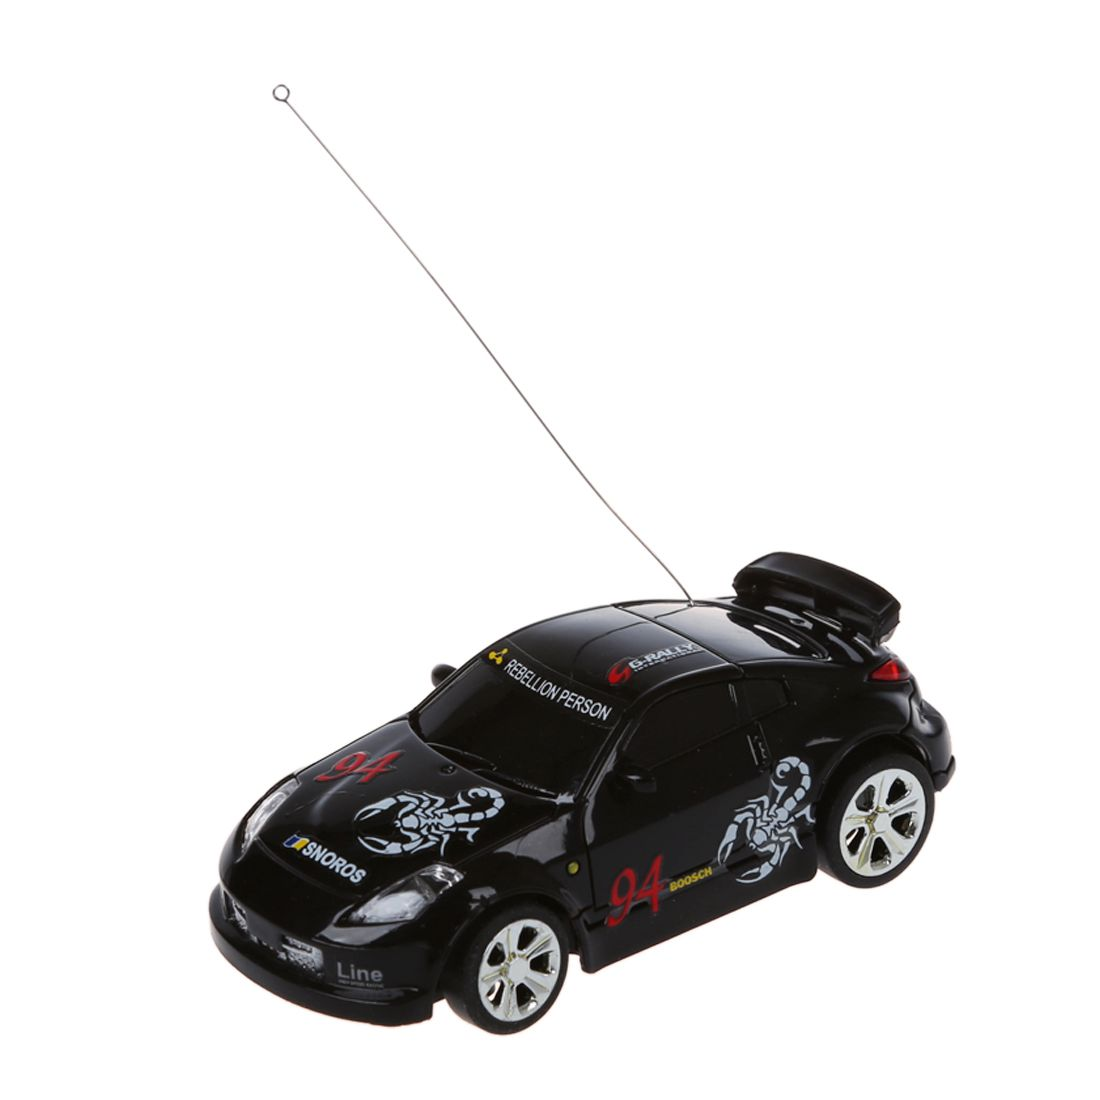 mini rc auto racing car spielzeug in der getraenkedose 1. Black Bedroom Furniture Sets. Home Design Ideas